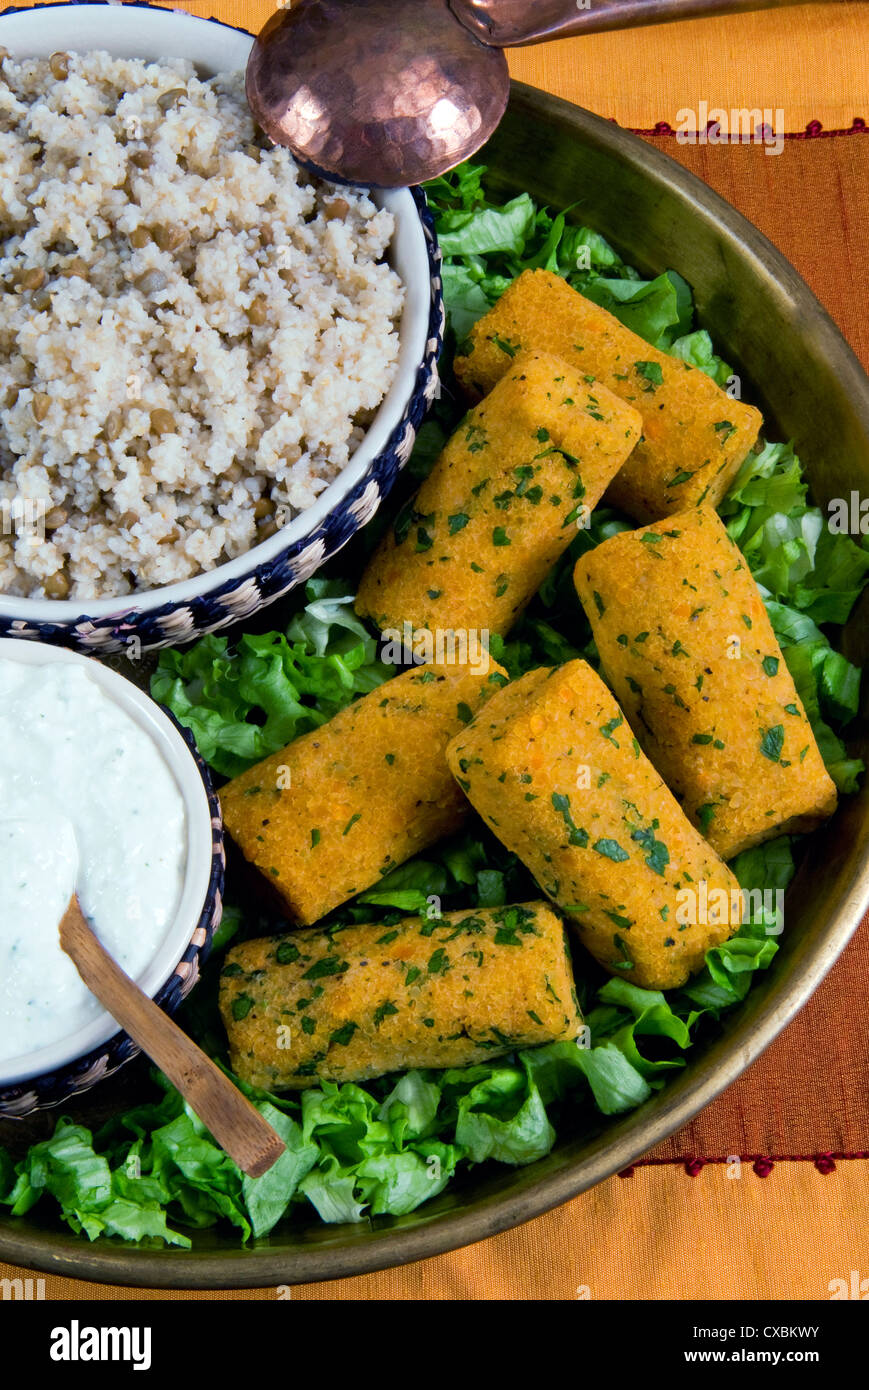 Mercimek koftesi, vegetarian balls with lentils, Turkish food, Turkey, Eurasia - Stock Image